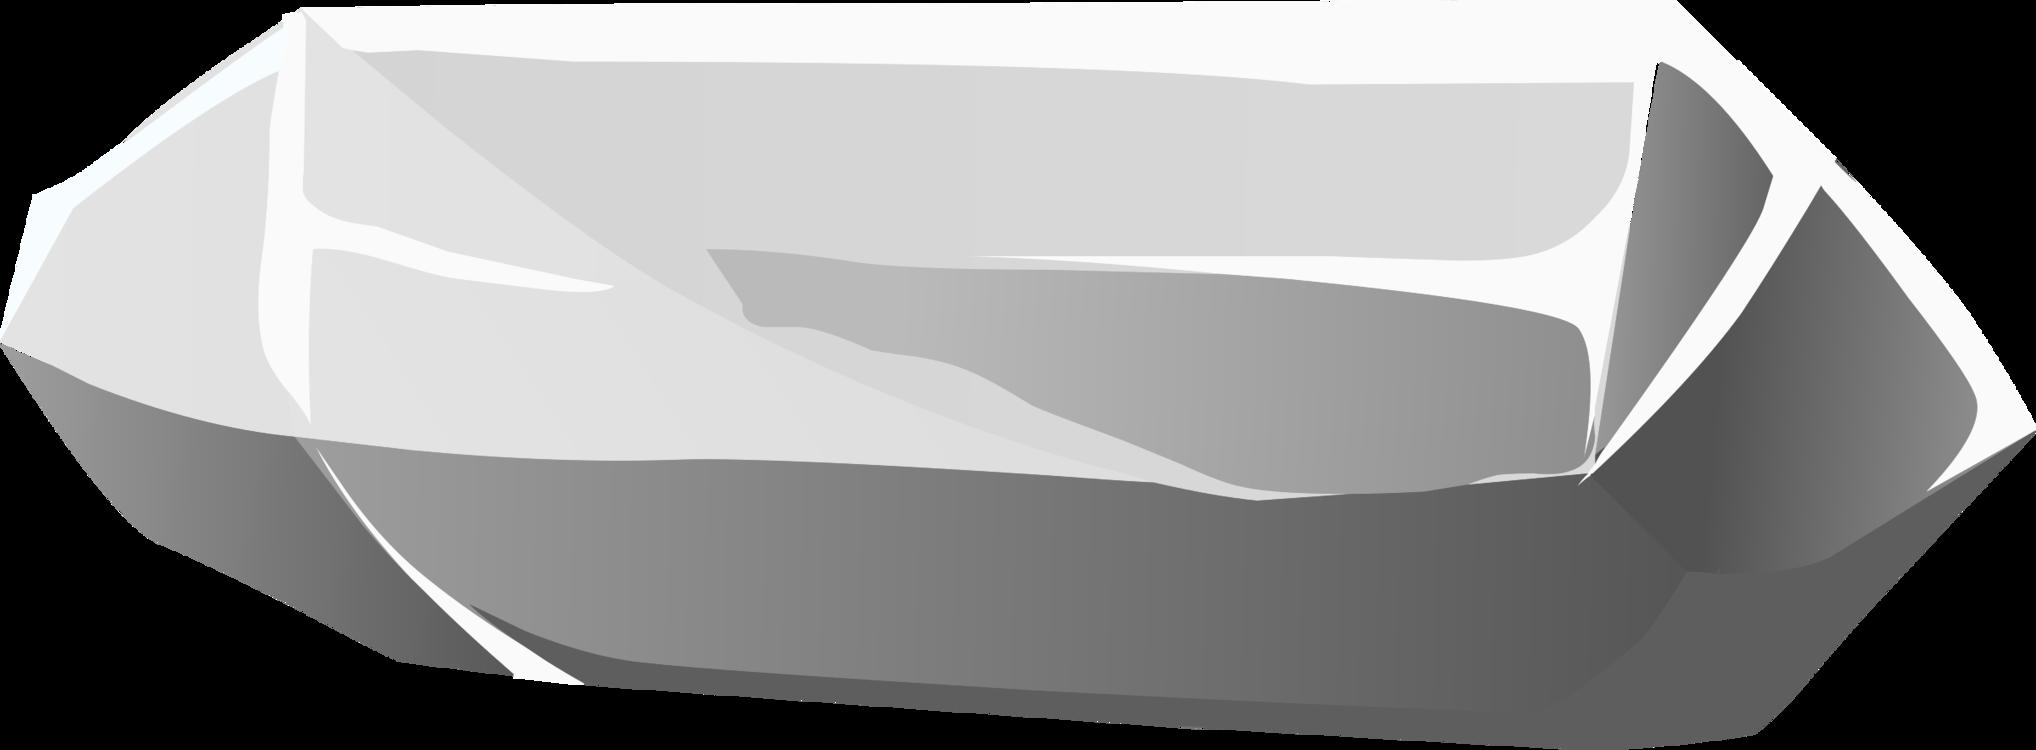 Angle,Personal Protective Equipment,Automotive Design